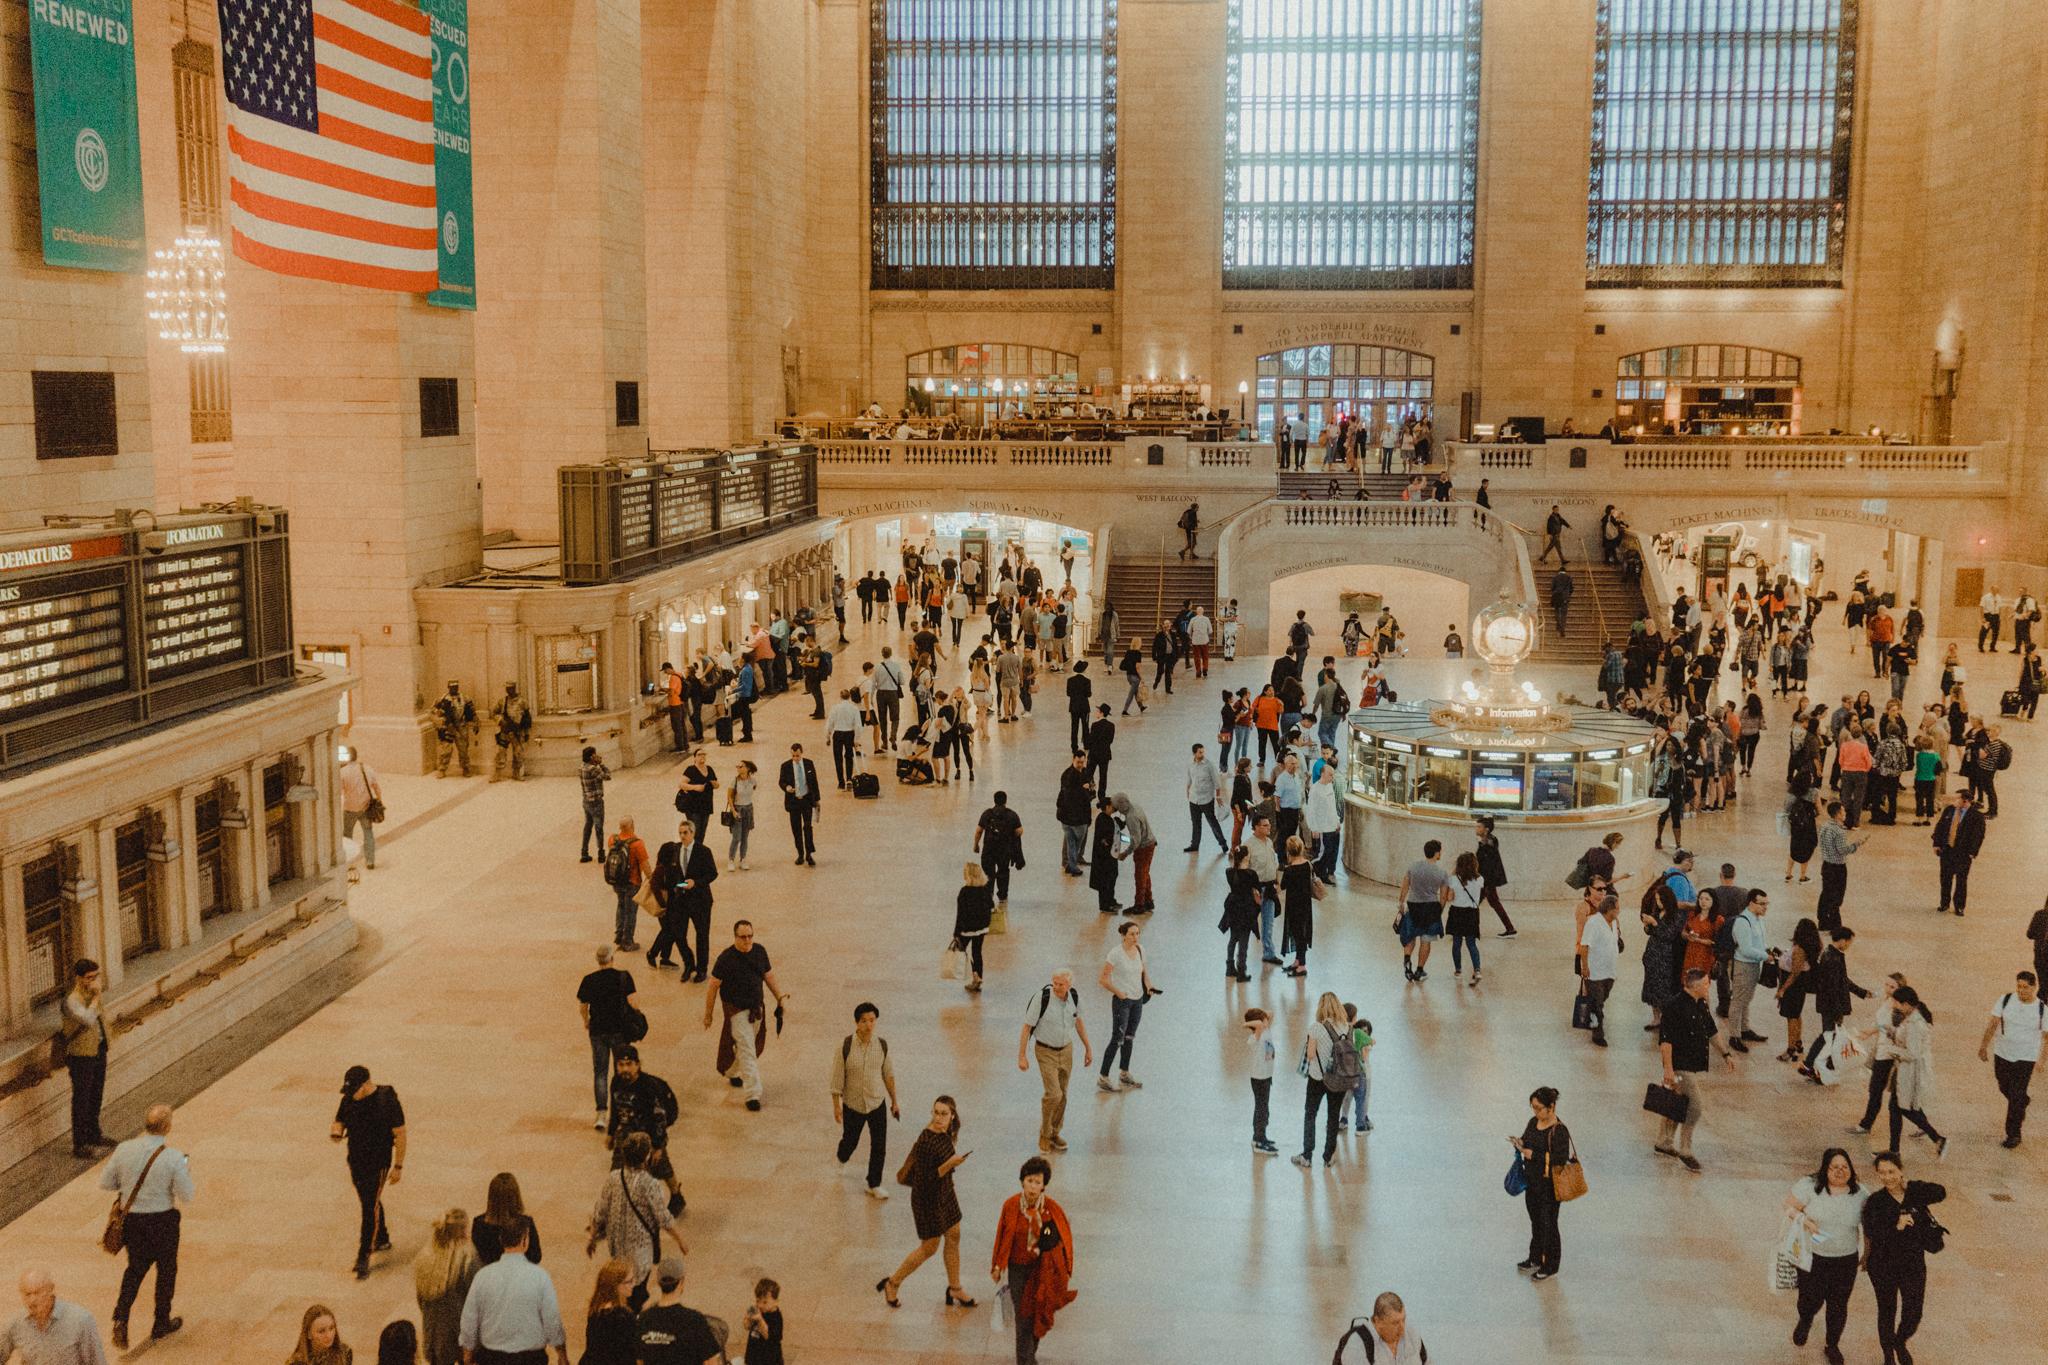 Grand Central Station, New York.